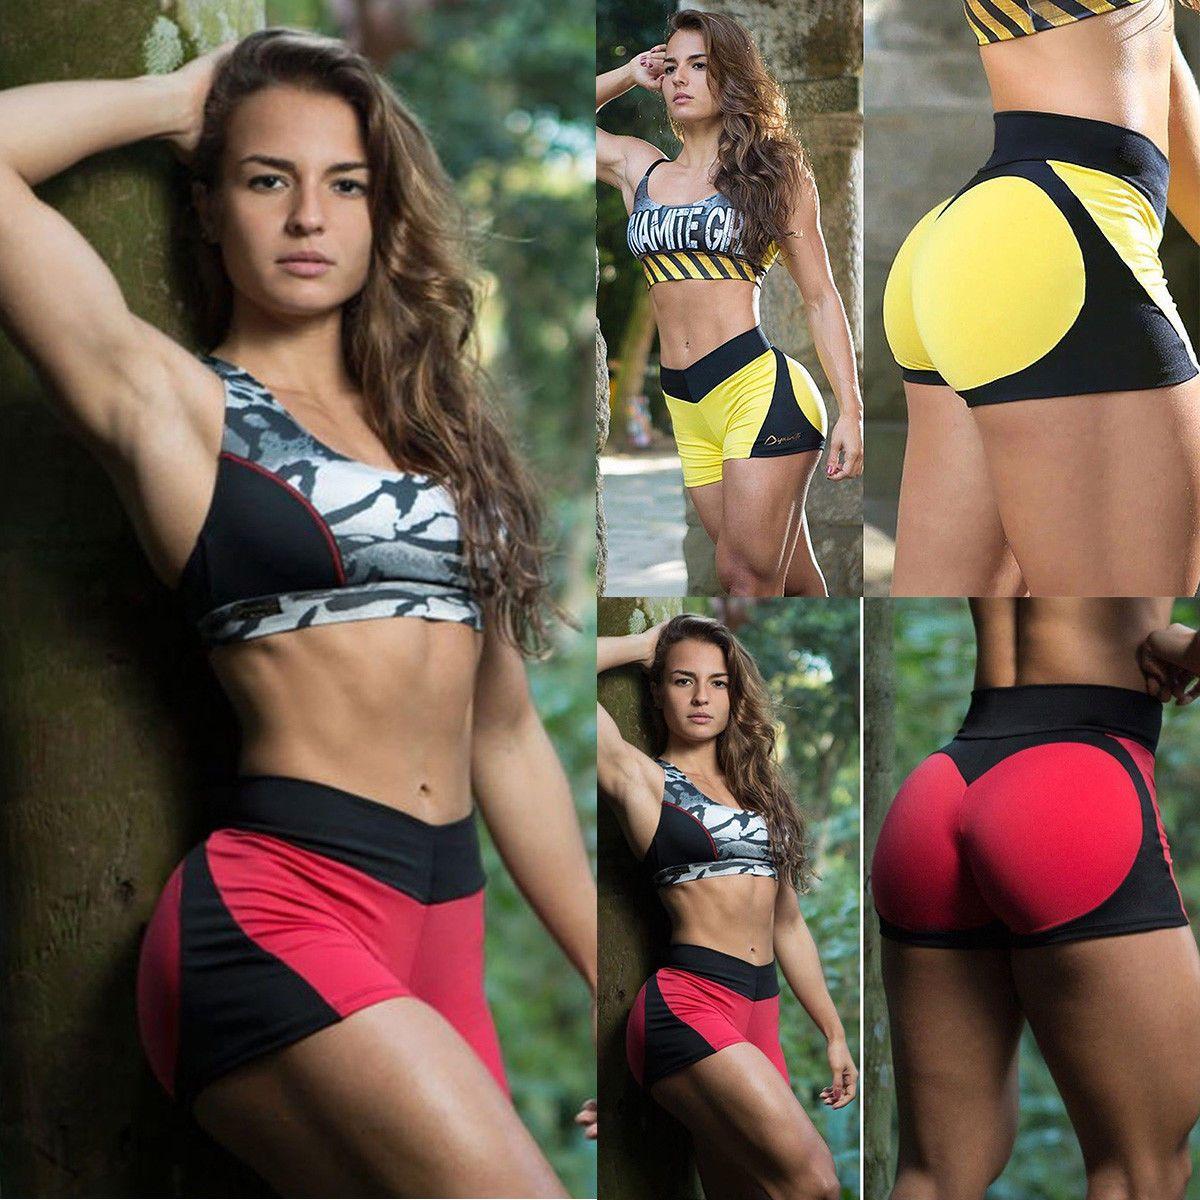 Promover/Dame/Kurz/Yogahose/Shorts/Knielang/Fitness/Sporthose/Laufhose/Blickdicht/Kurze/Sport/Leggings/Radlerhose/mit/Hohe/Taille/Taschen/Bauchkontrolle